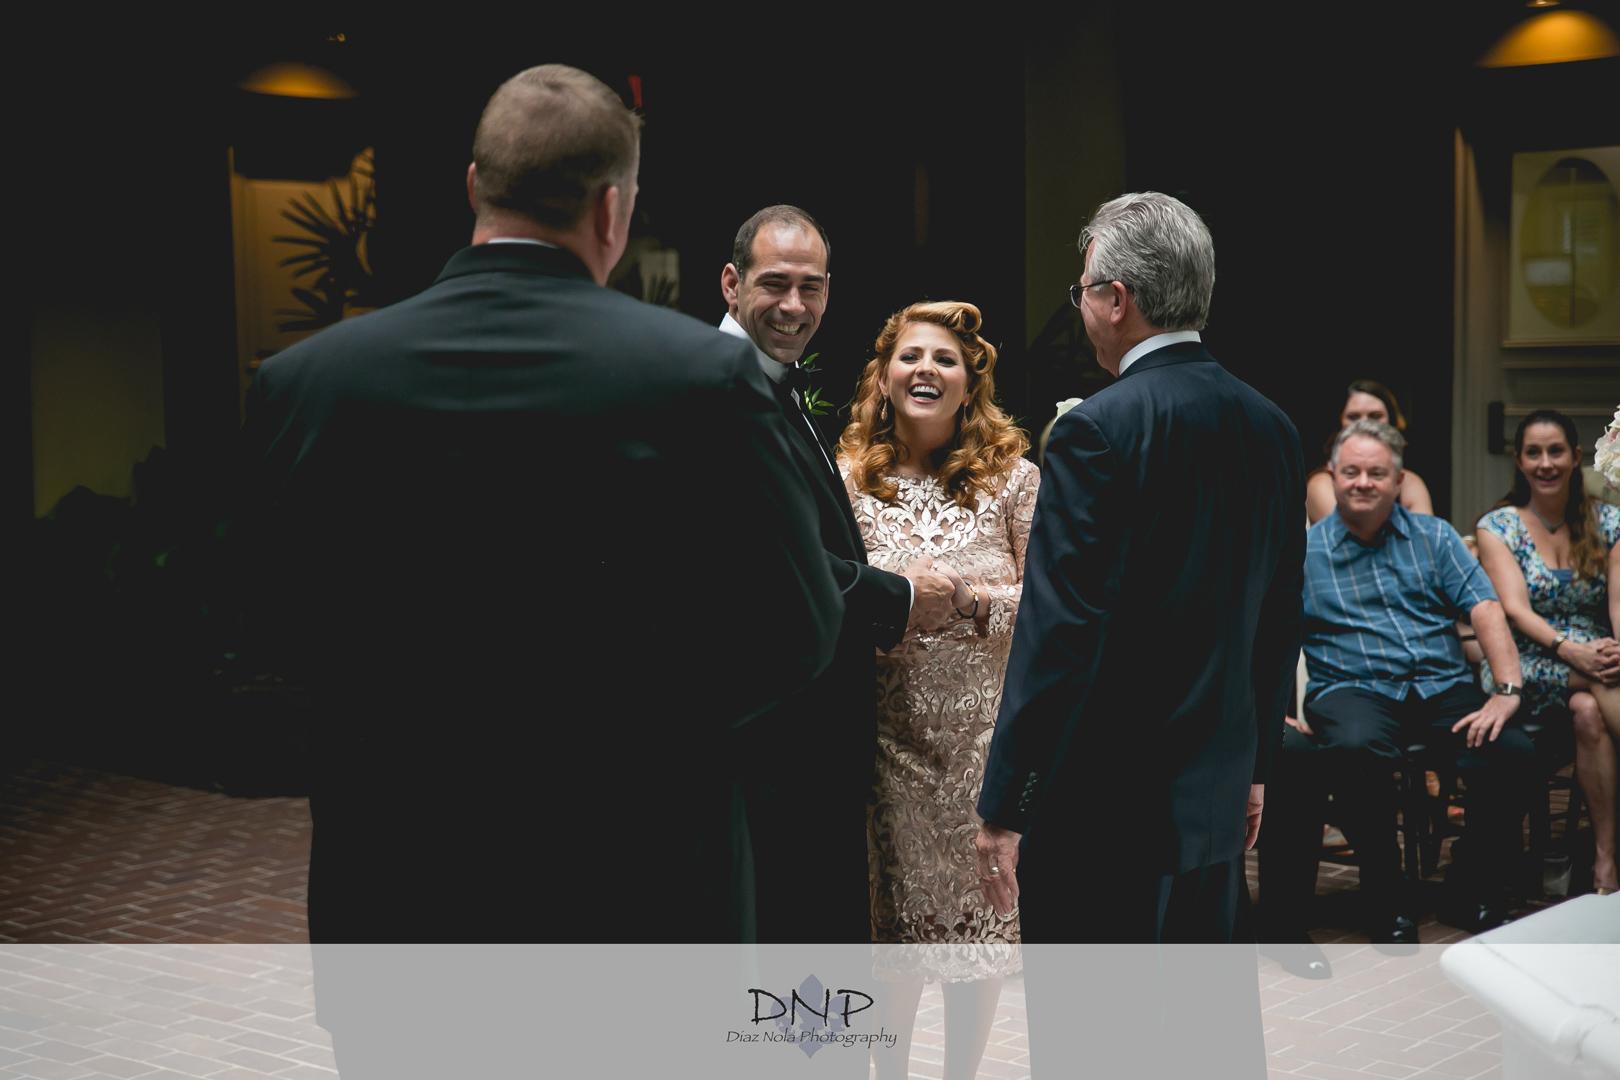 Tiffany + Chris Wedding- Hotel Mazarin (42 of 86)